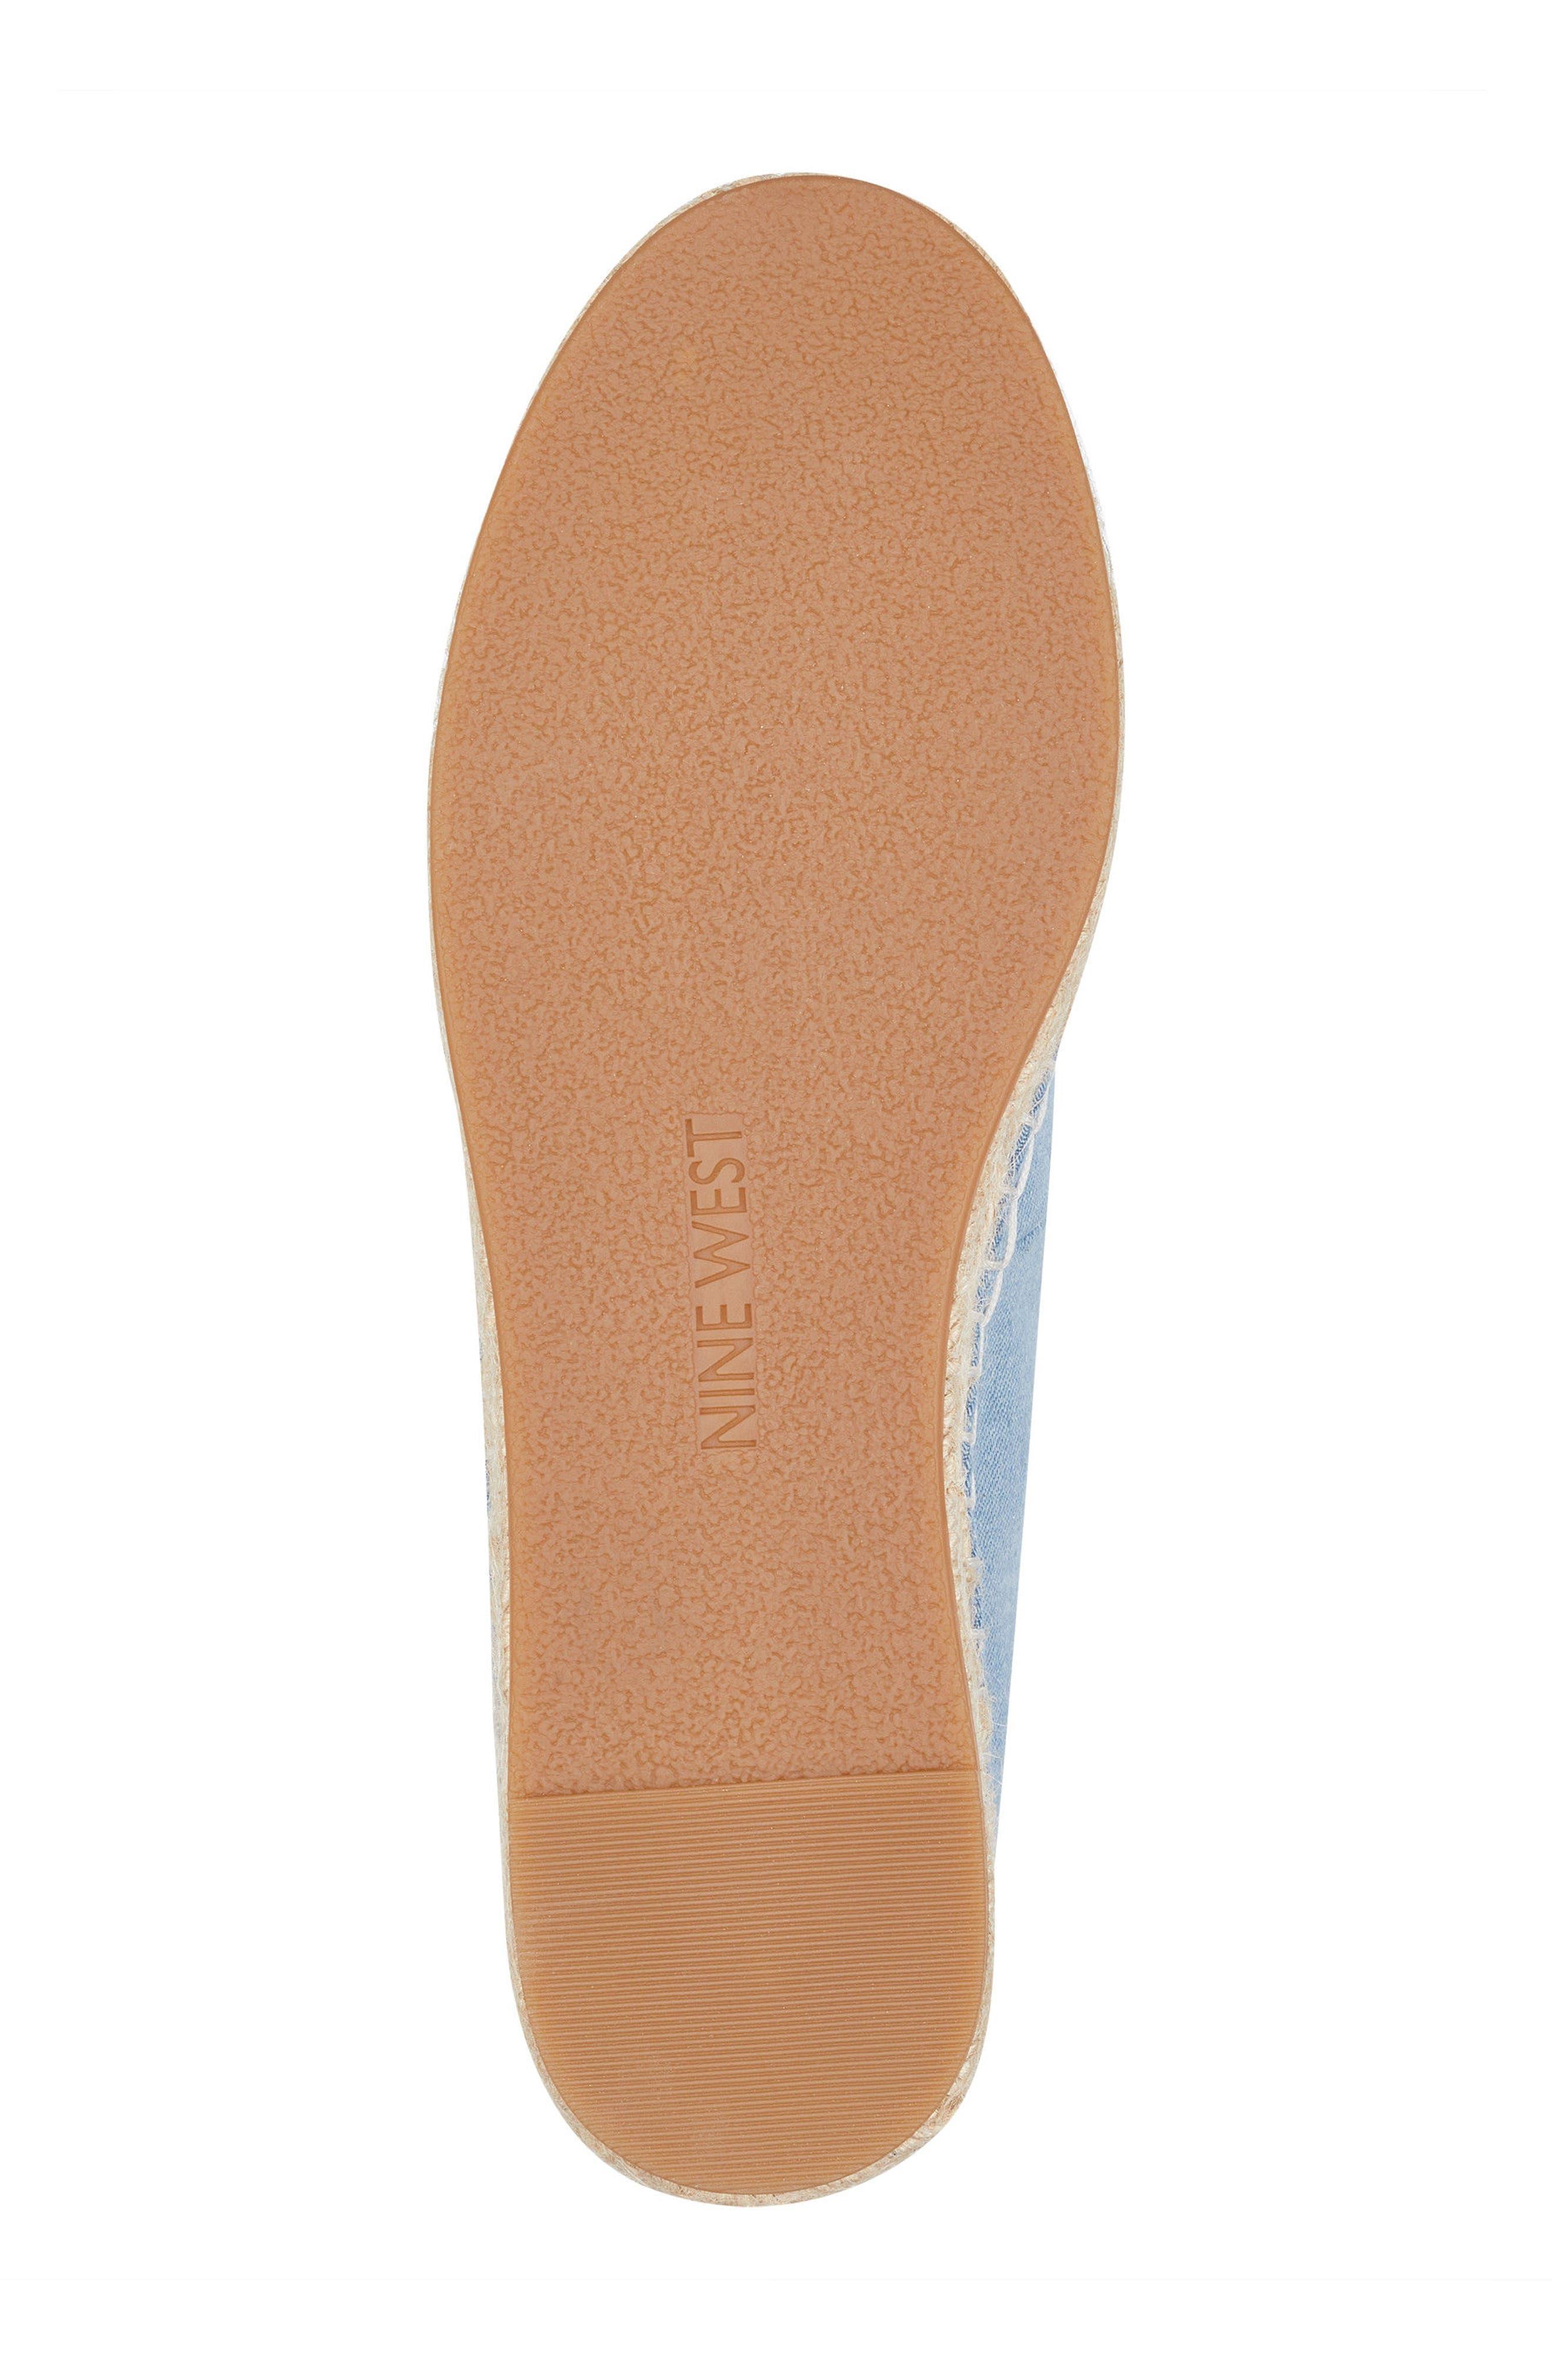 Guinup Embellished Espadrille Sneaker,                             Alternate thumbnail 6, color,                             Light Blue/ White Denim